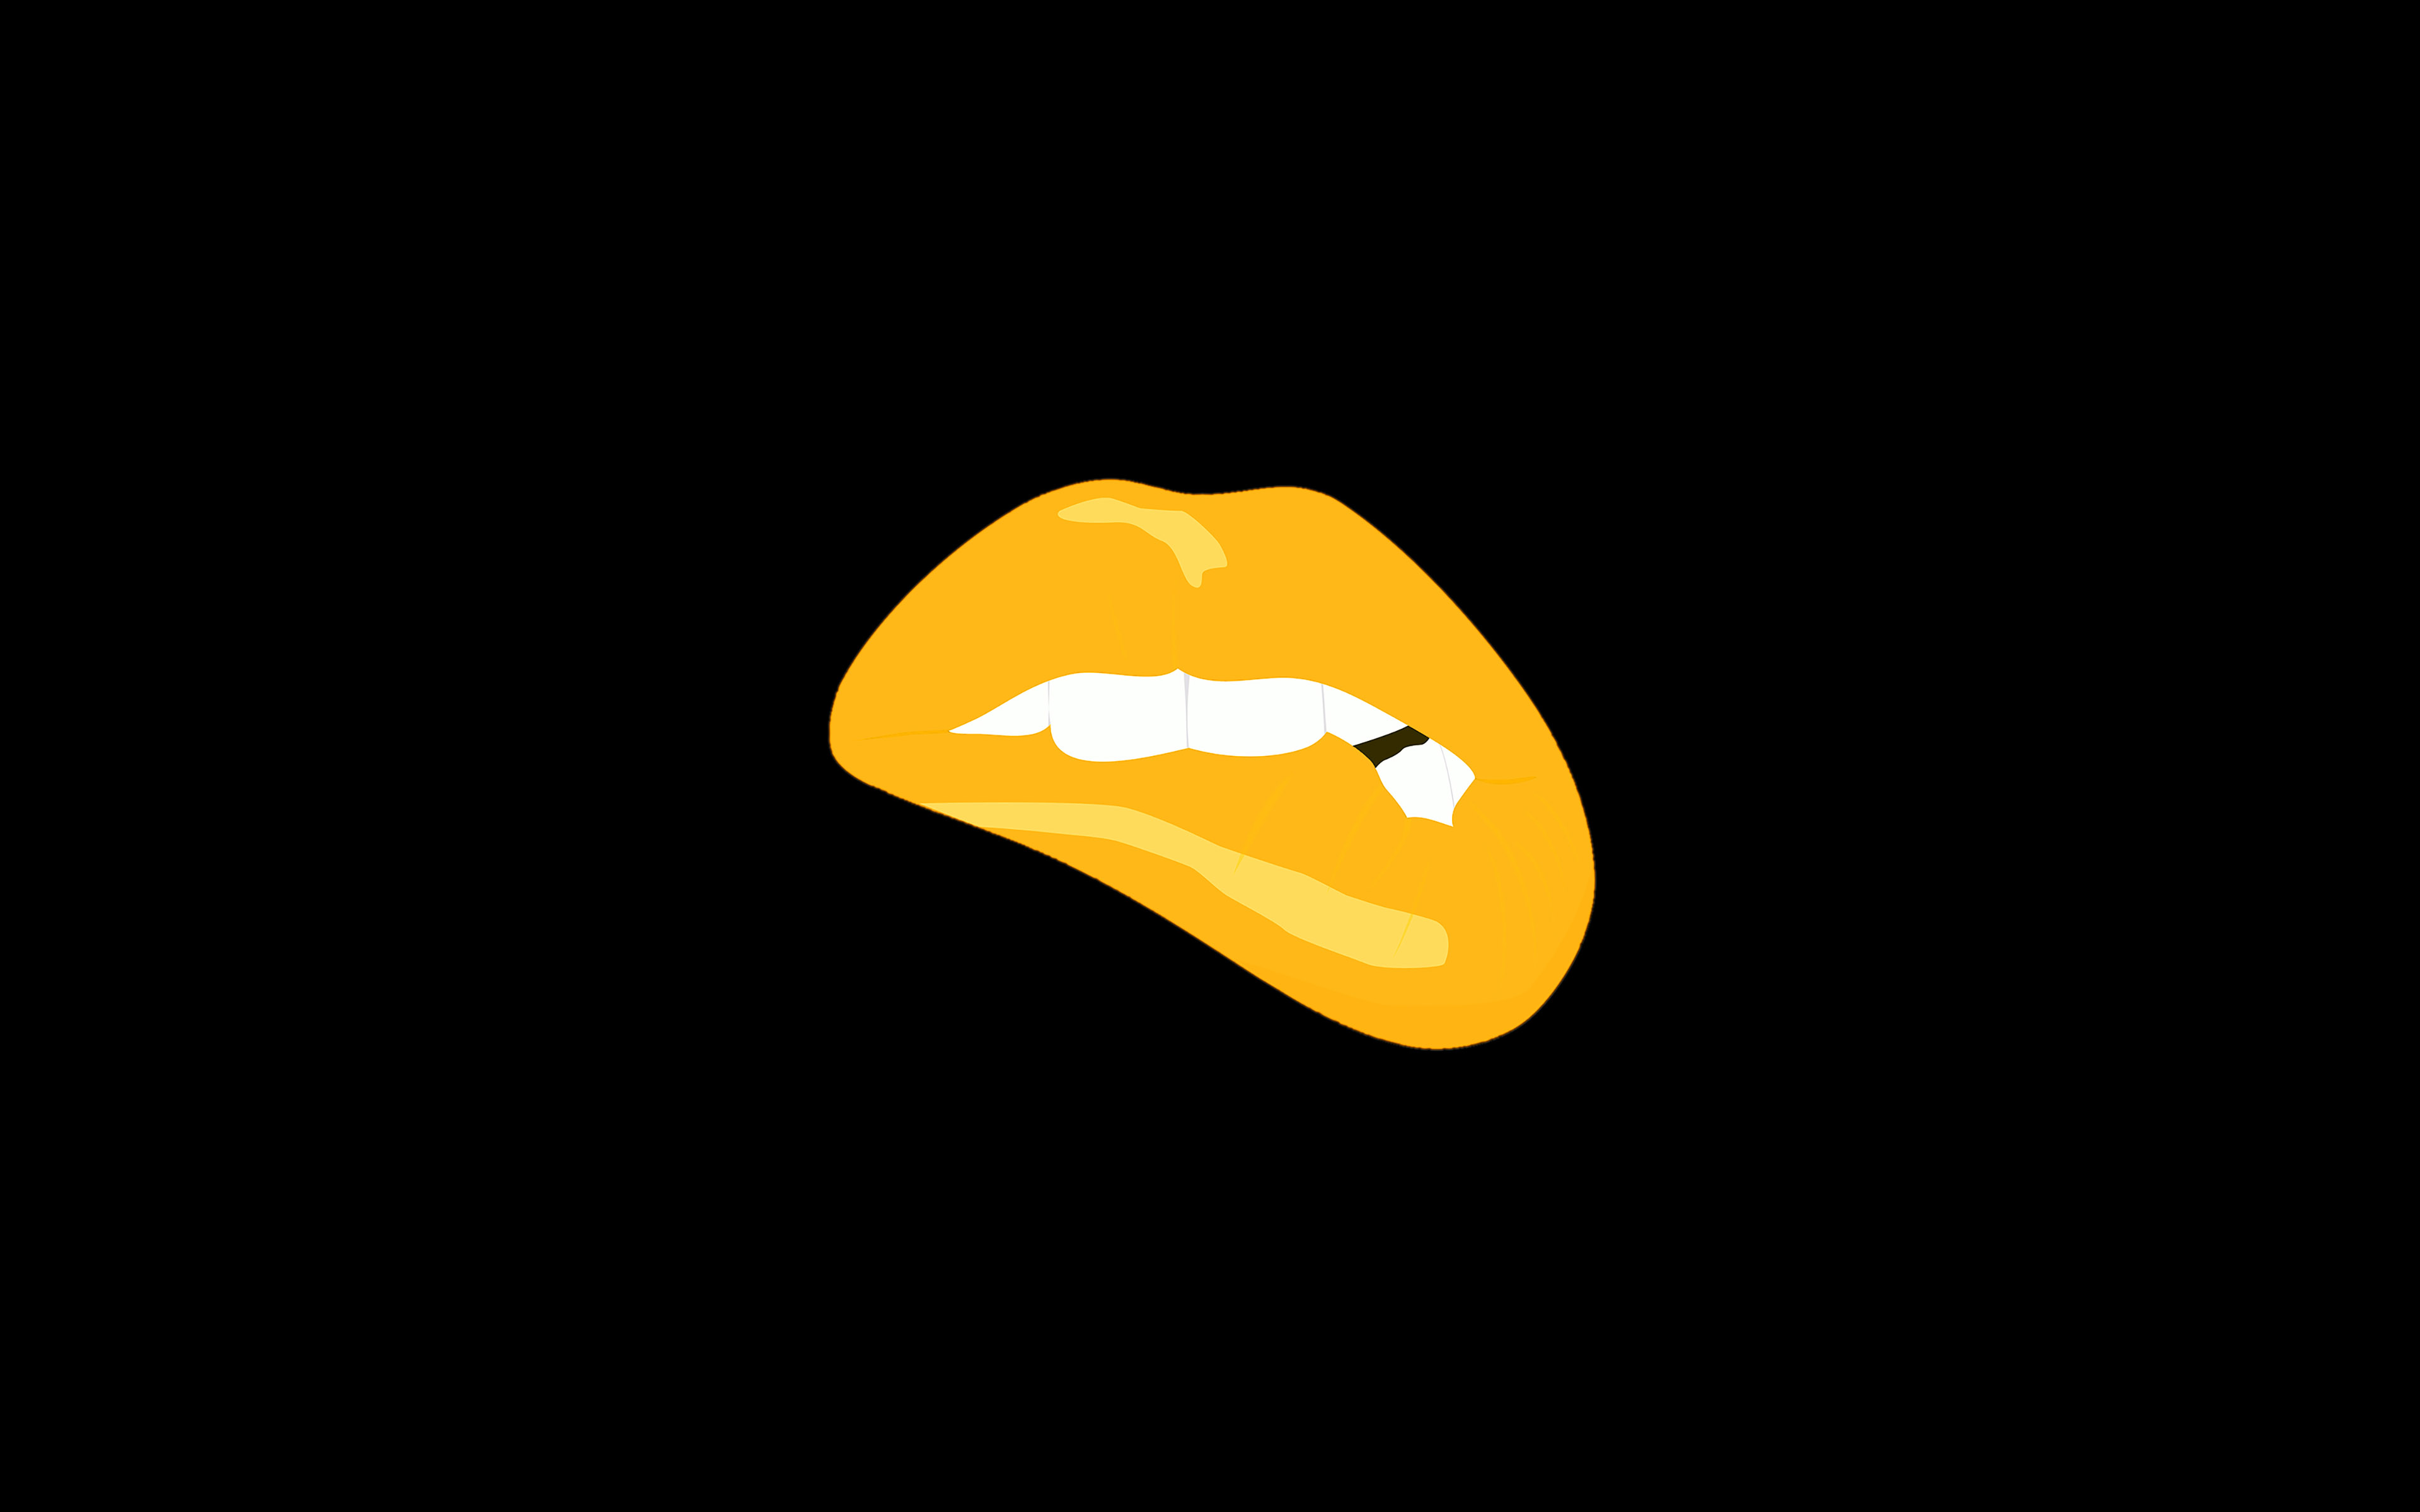 ae54-biting-lips-gold-black-background-minimal-art-wallpaper Sony Logo Black Background